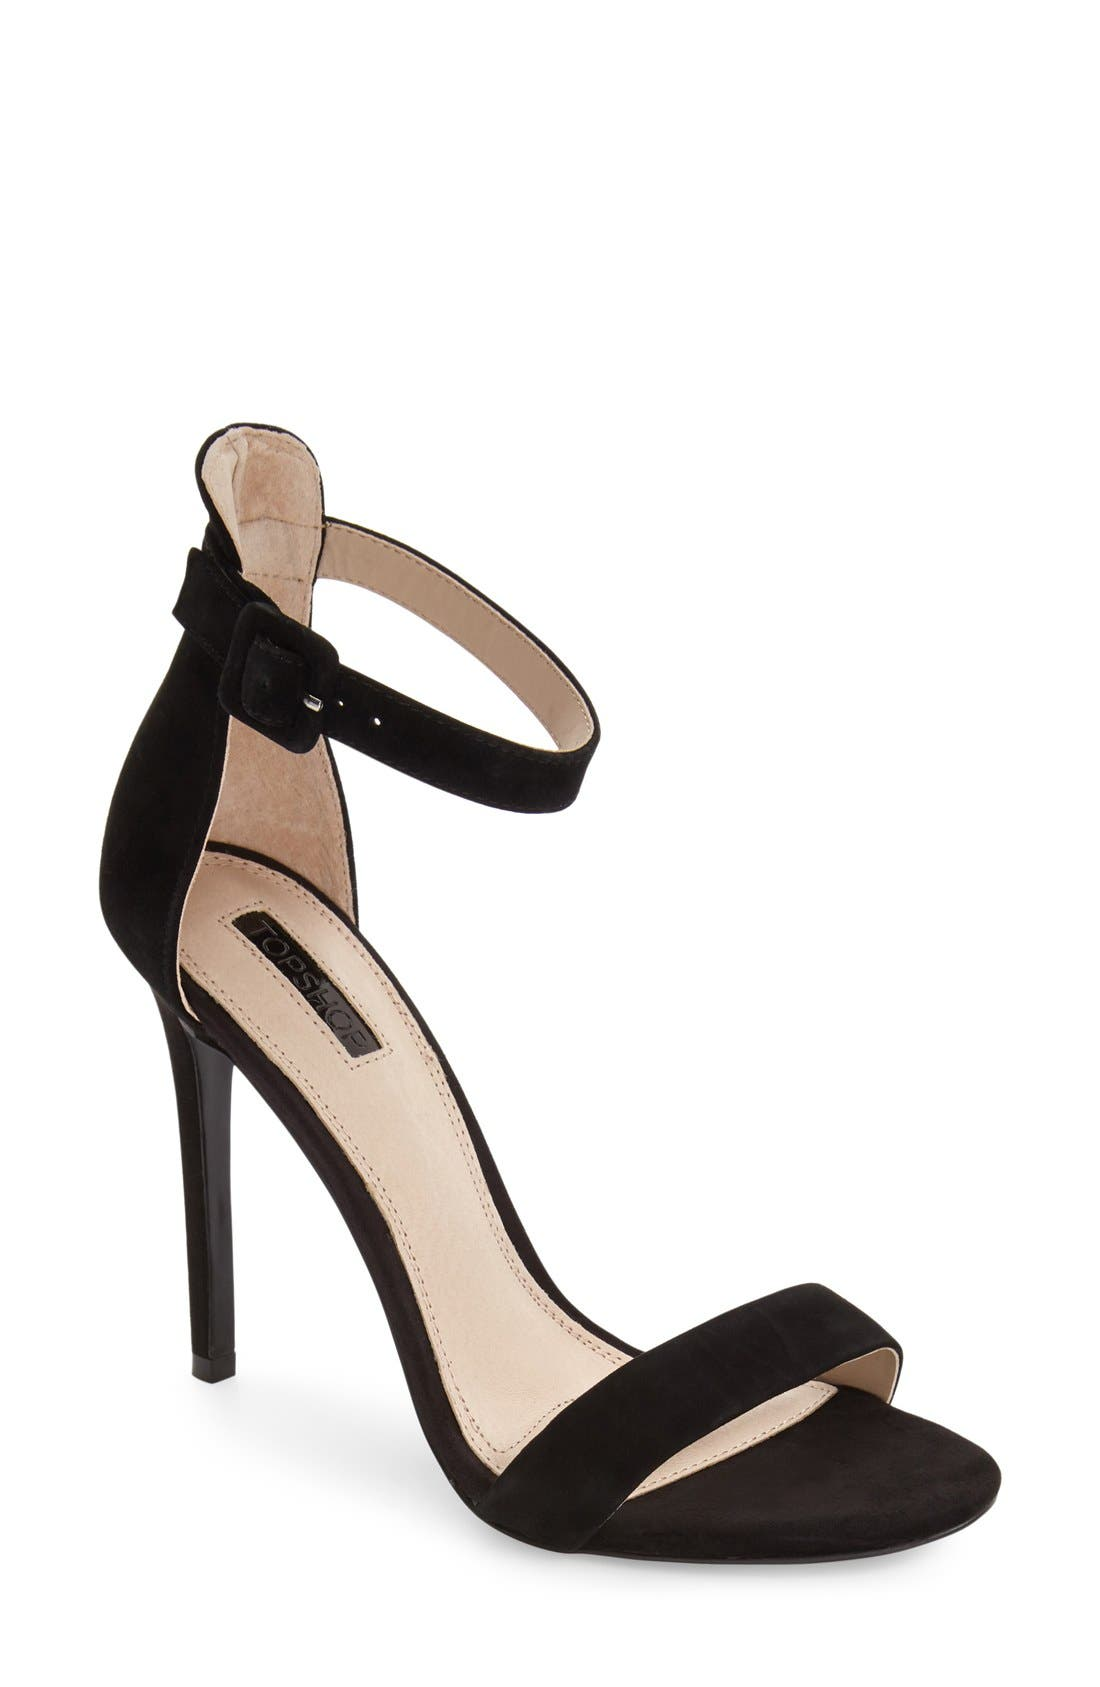 Main Image - Topshop 'Rita' Ankle Strap Sandal (Women)